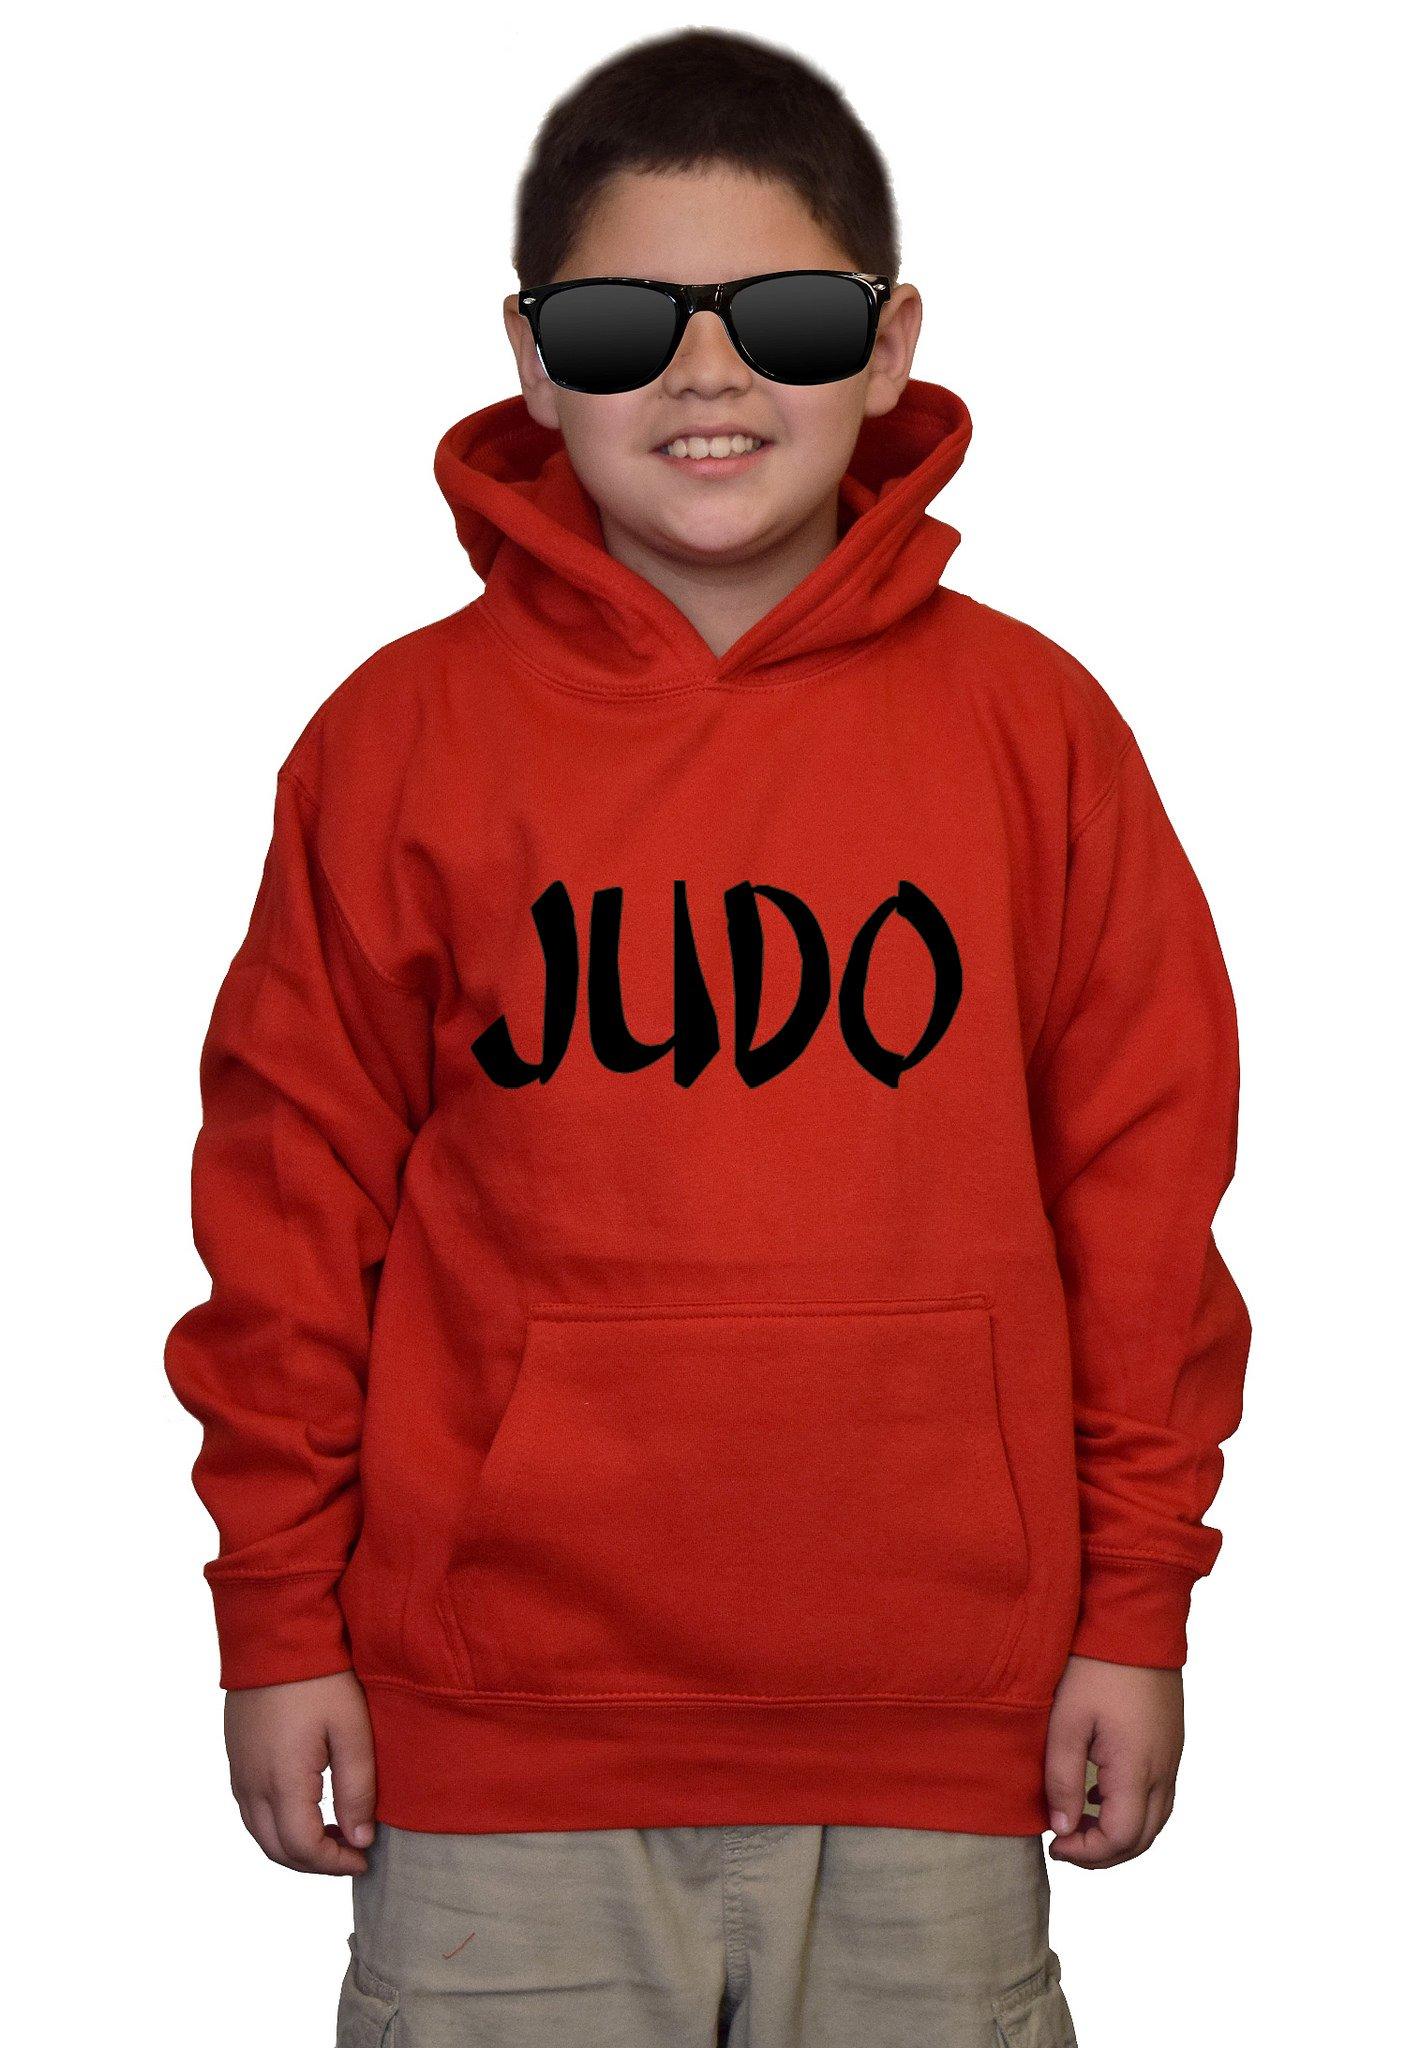 Youth Judo MMA V439 Red kids Sweatshirt Hoodie Medium